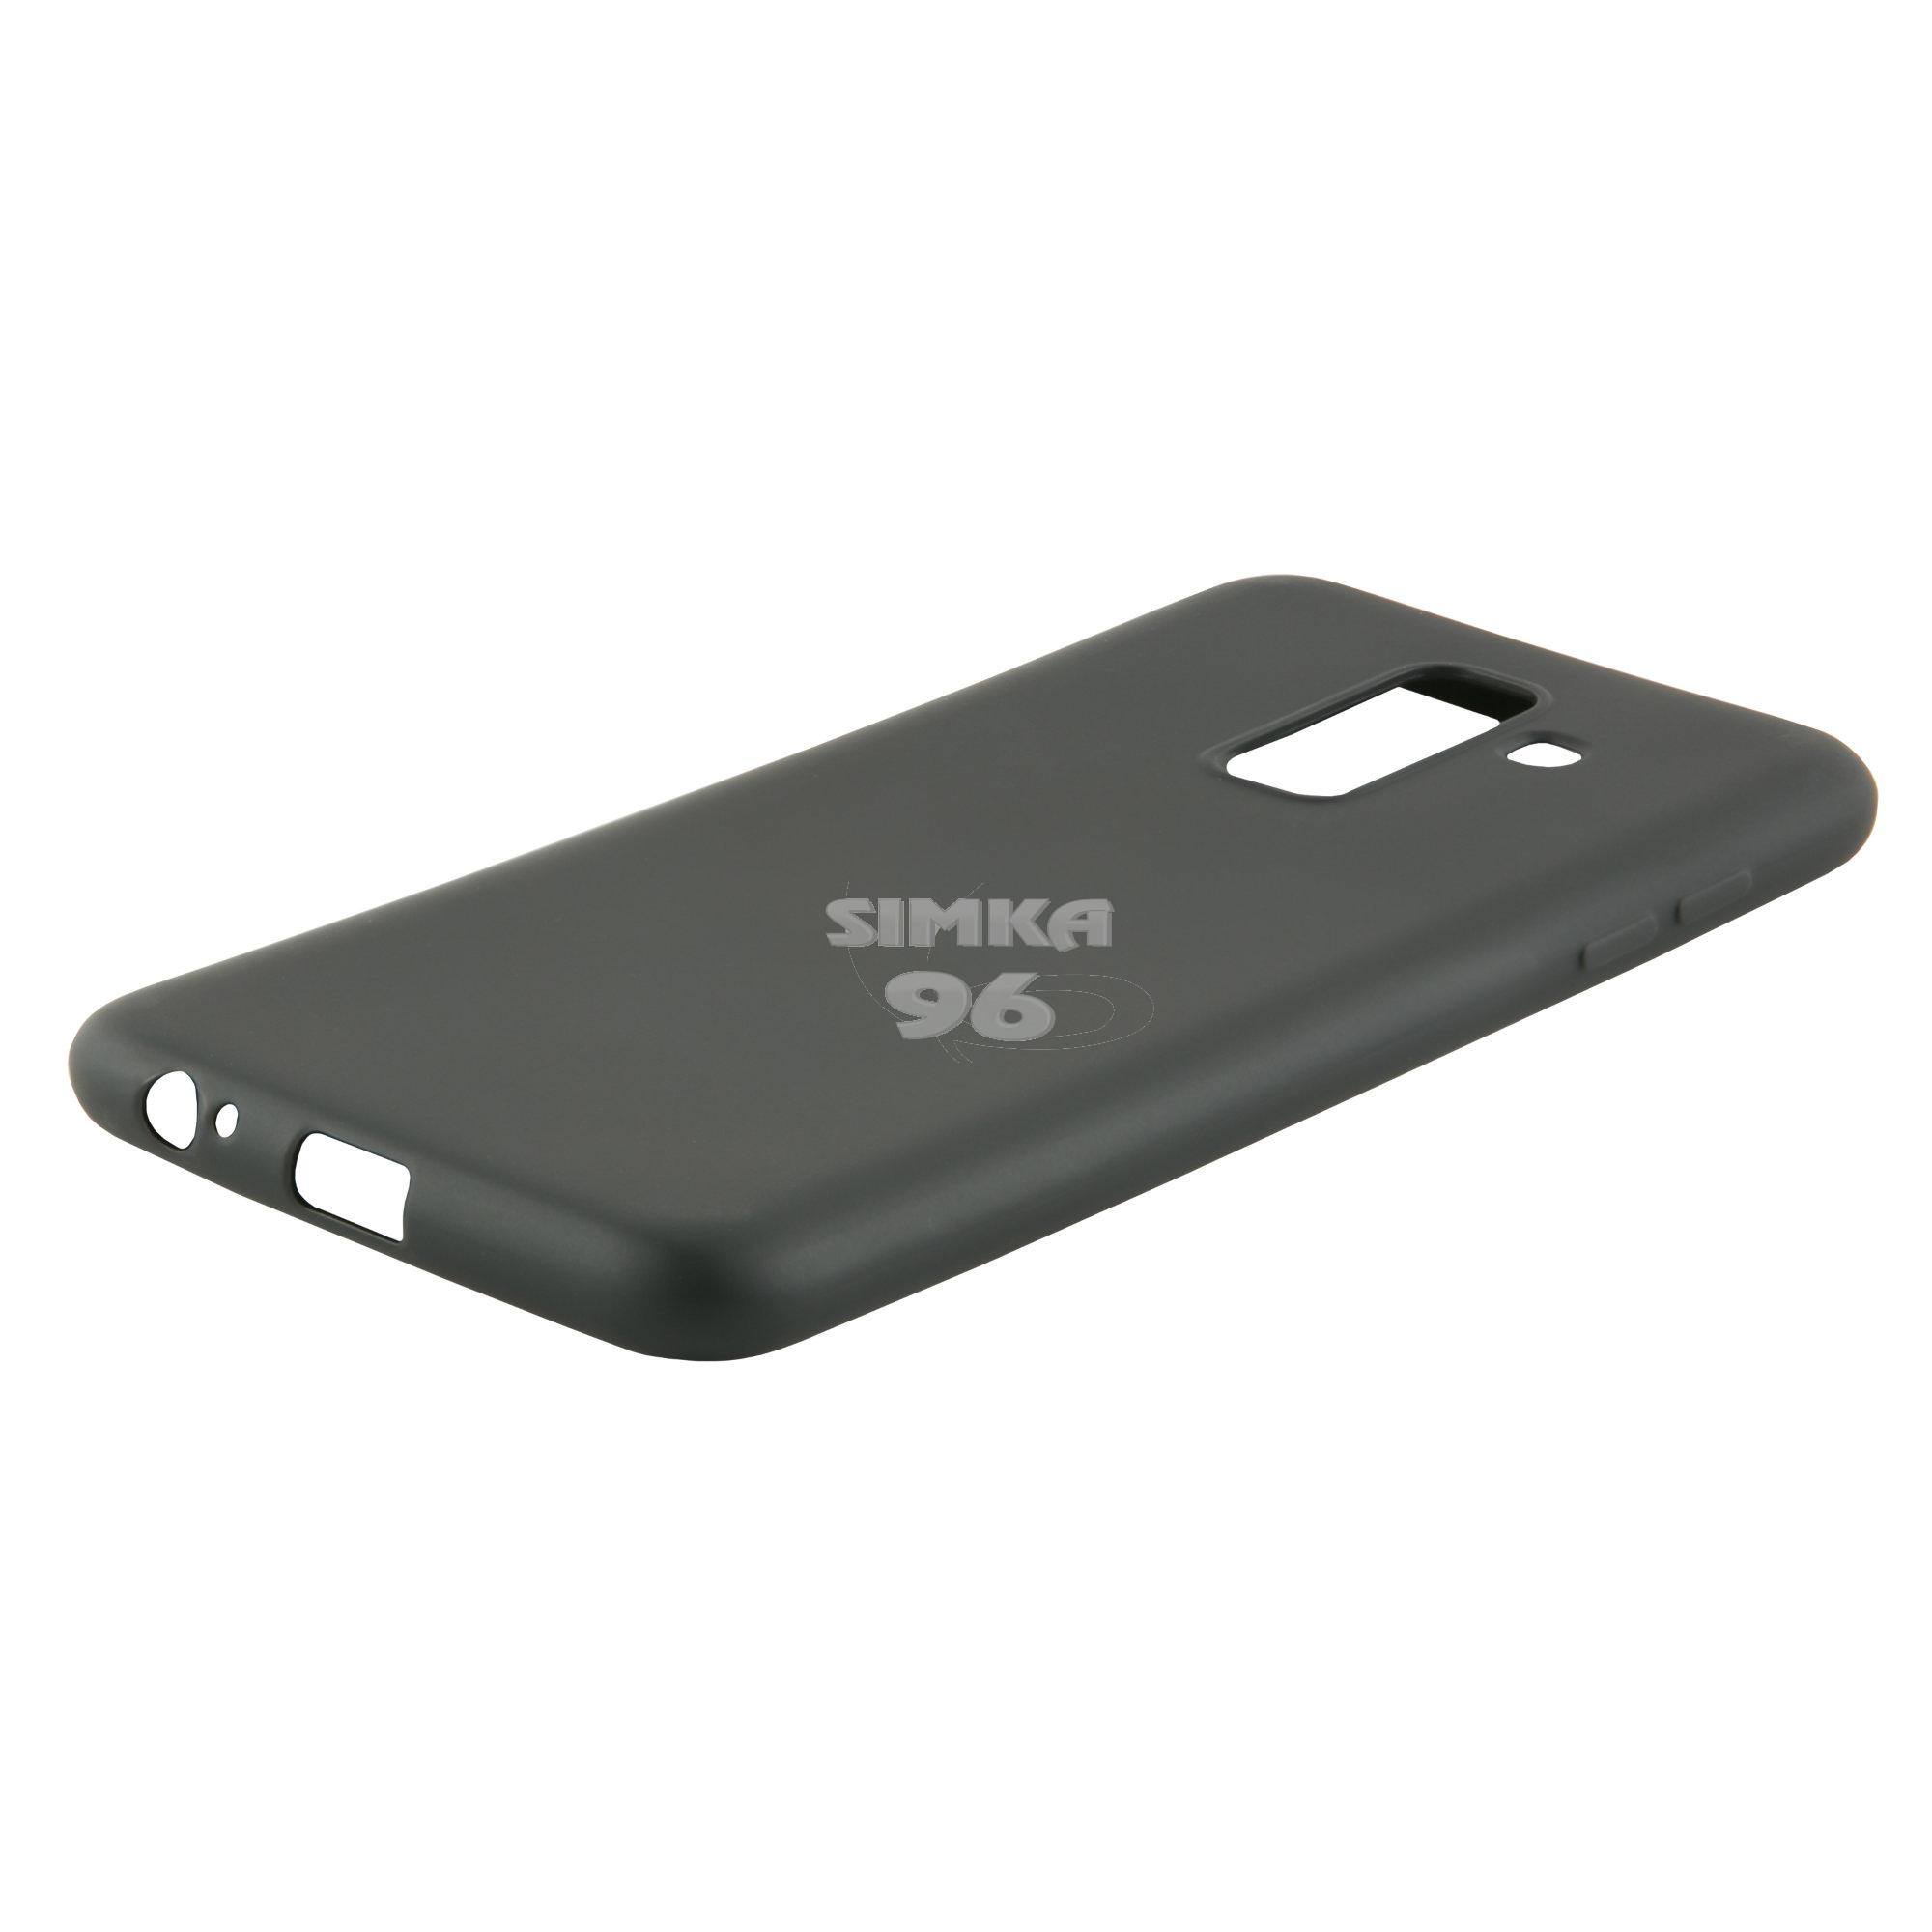 Чехол задник для Xiaomi Redmi S2 (6x) силикон